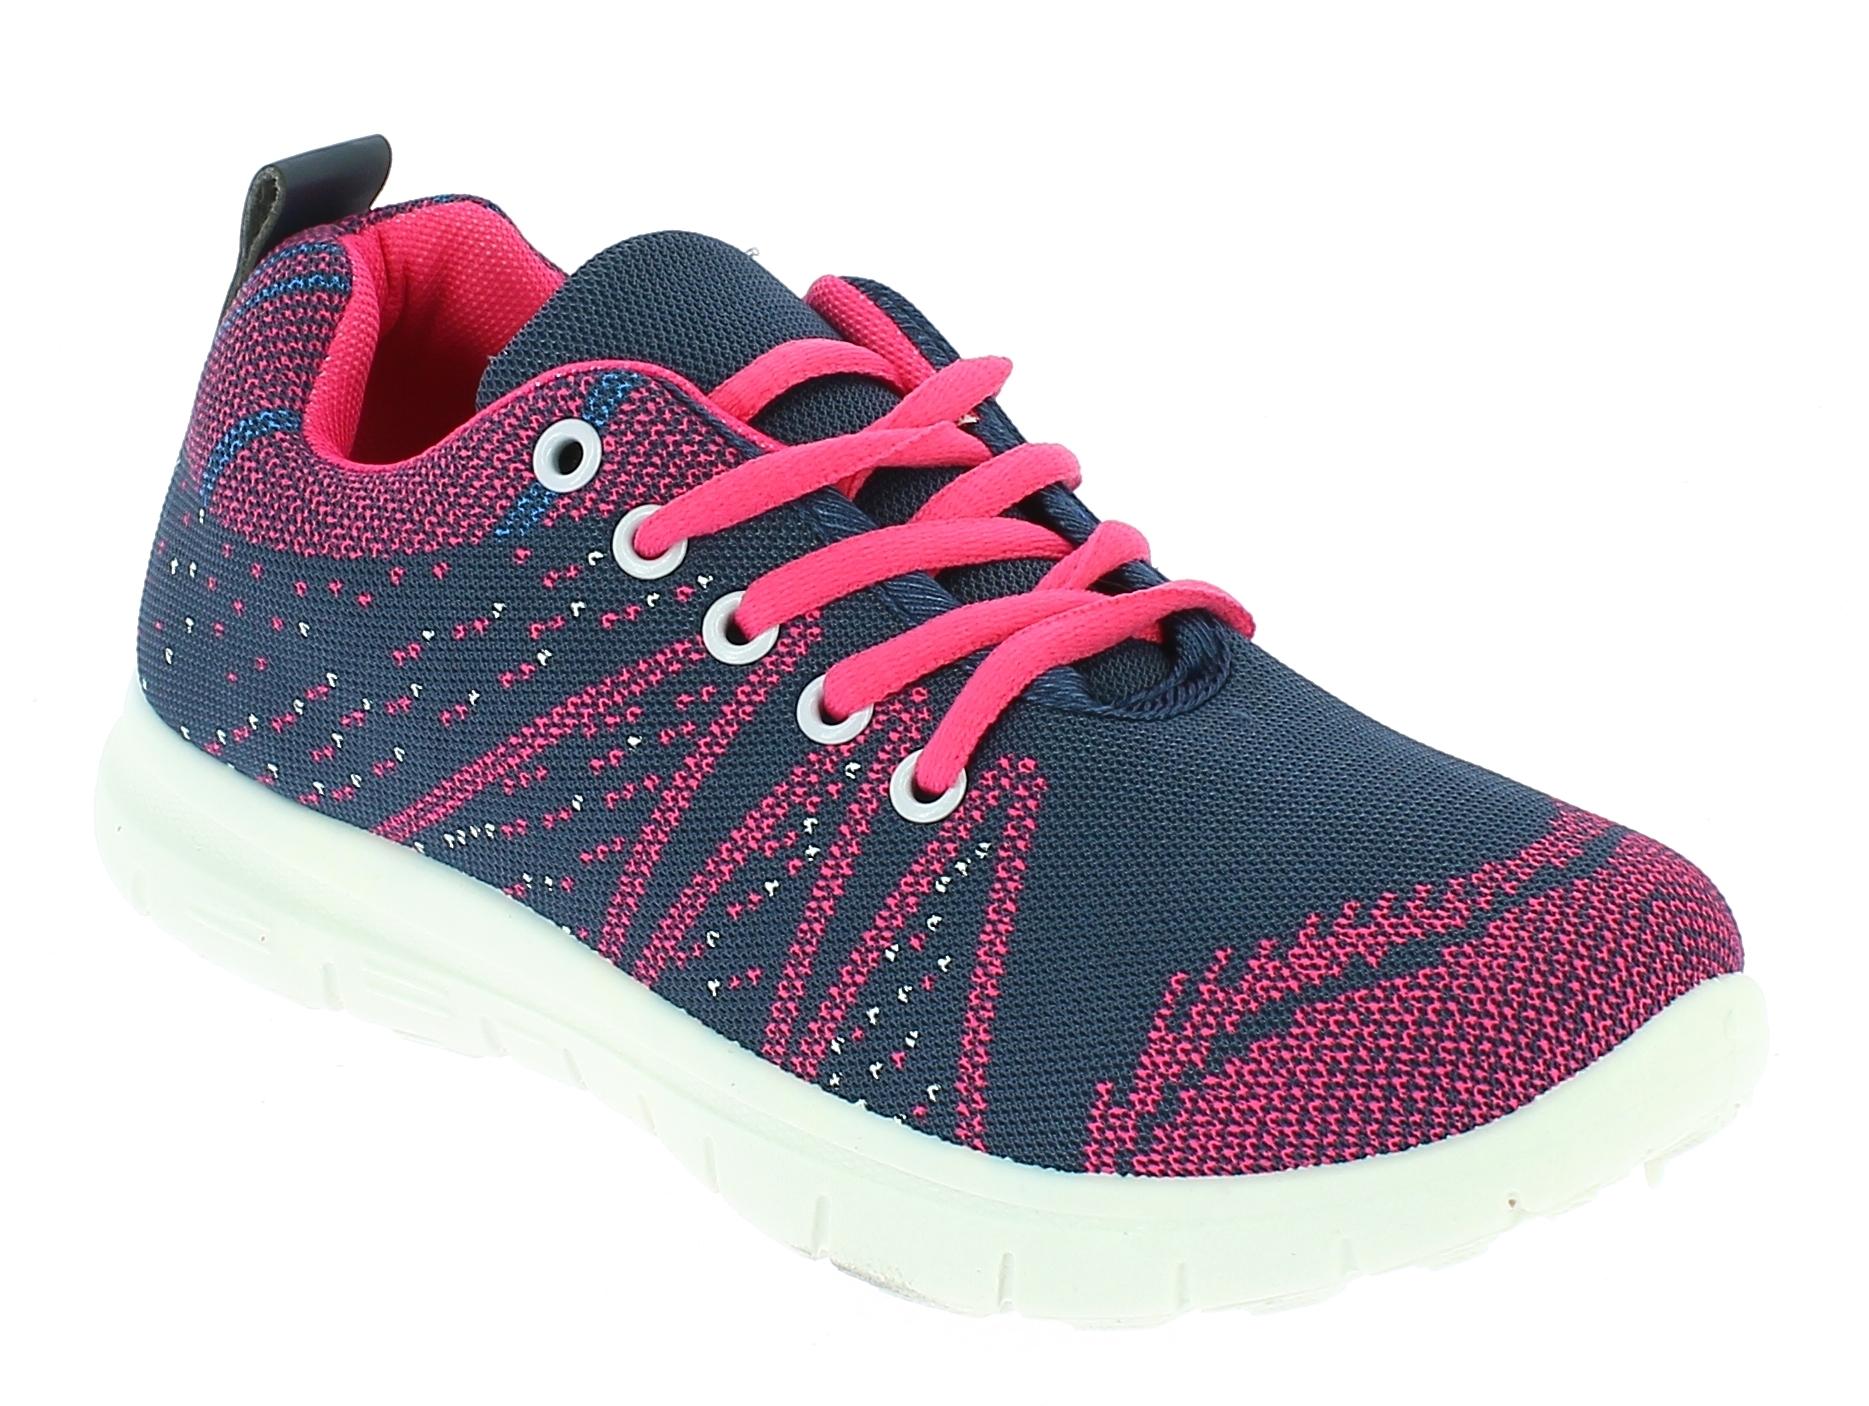 D.T NEW YORK Γυναικείο Αθλητικό B415613 Mπλέ/Φούξια - IqShoes - B415613 BLUE/FUC παπούτσια  new in